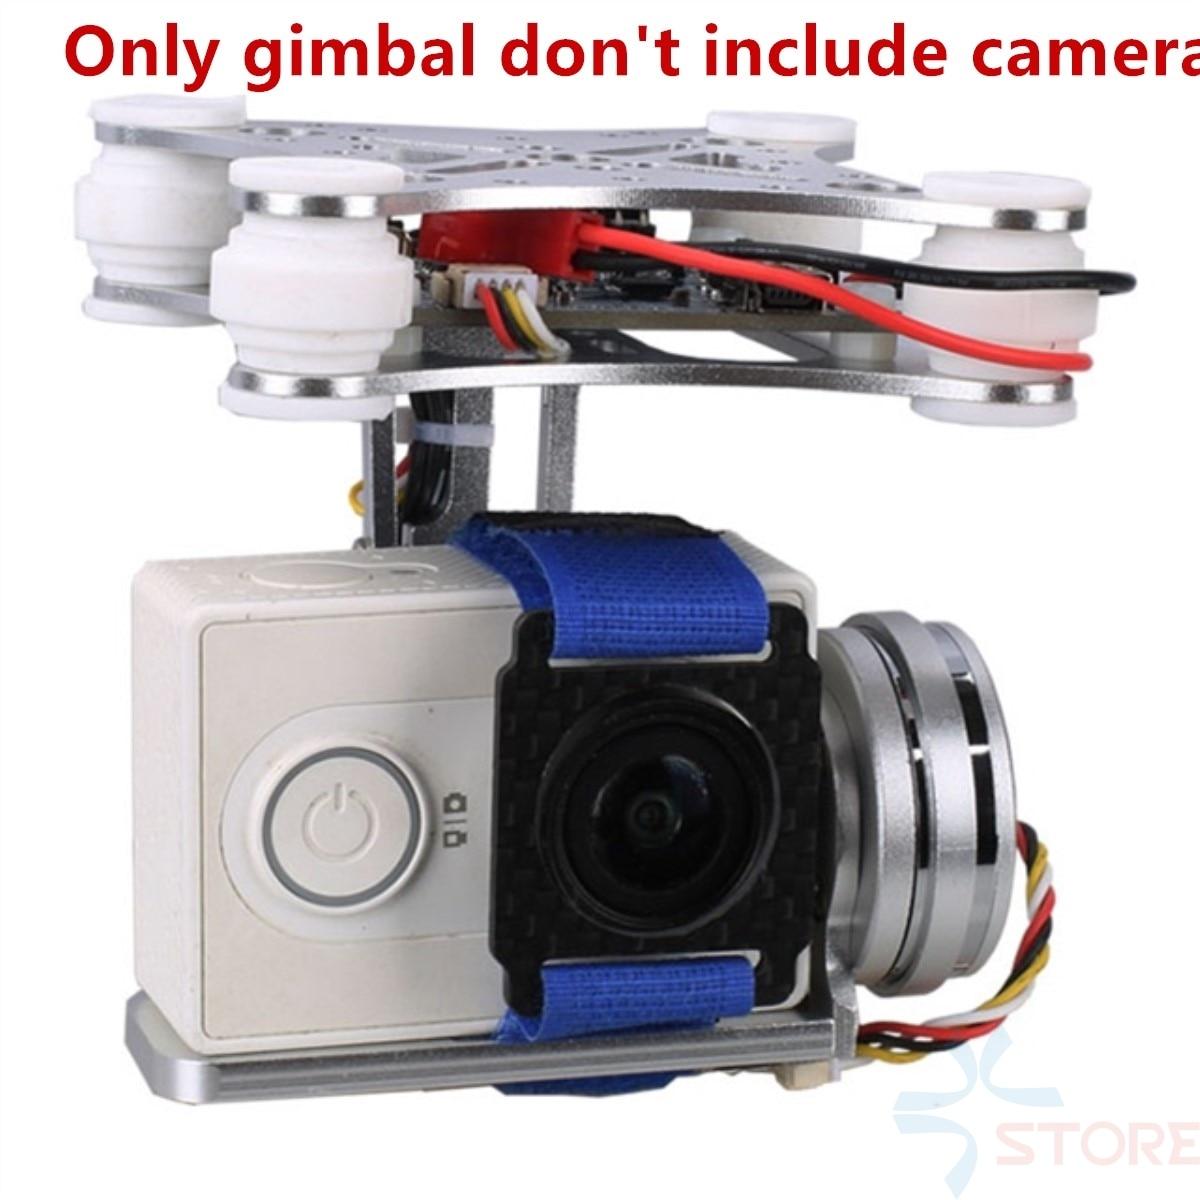 2 Aixs 2D Brushless Caméra Cardan pour Gopro SJCAM XIAOMI YI D'action Caméra Eken F450 F550 S500 FPV Drone Multirotor quadrocopter